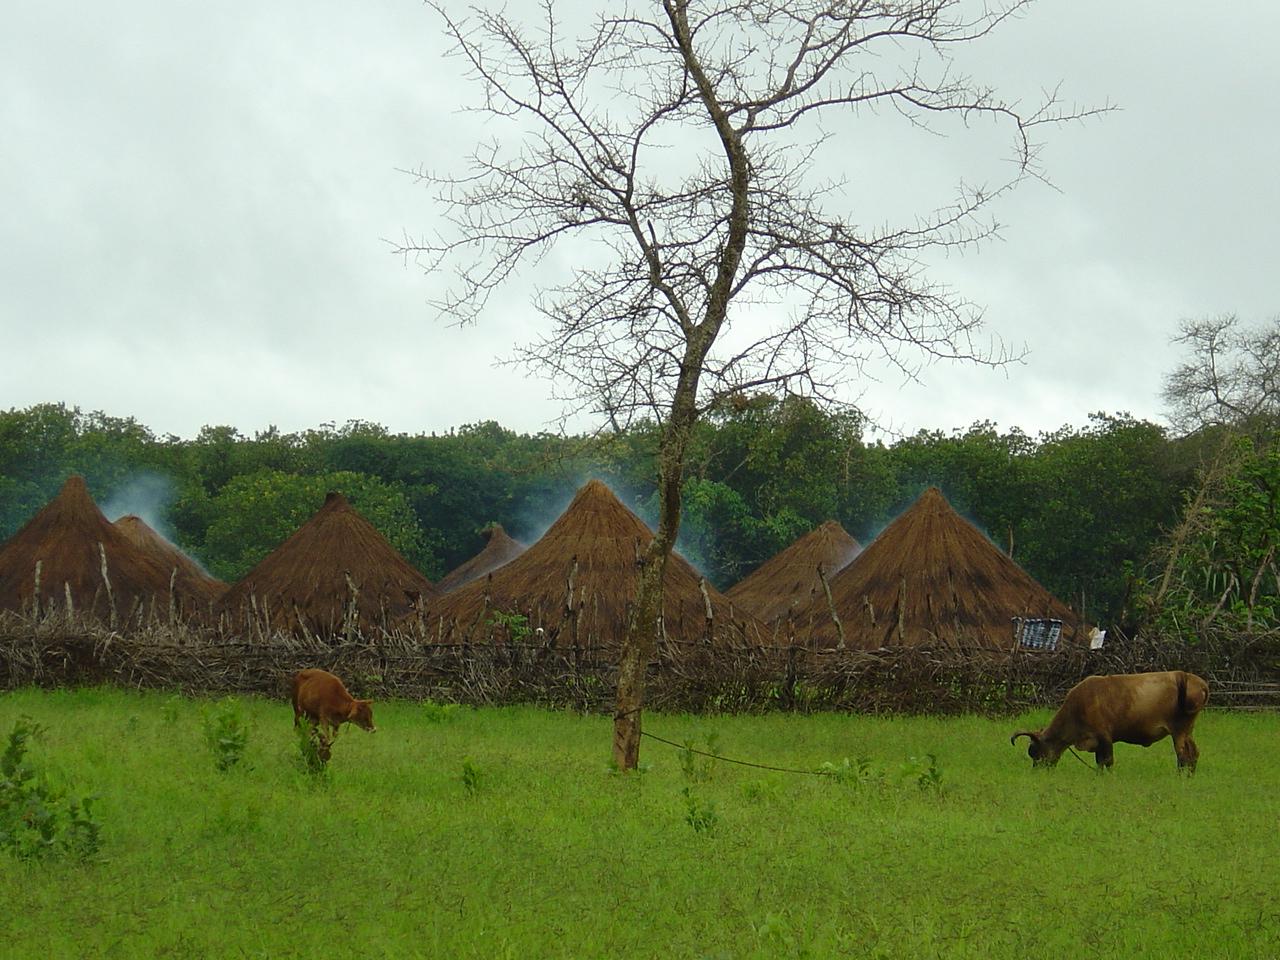 Villaggio_Guinea-Bissau.JPG